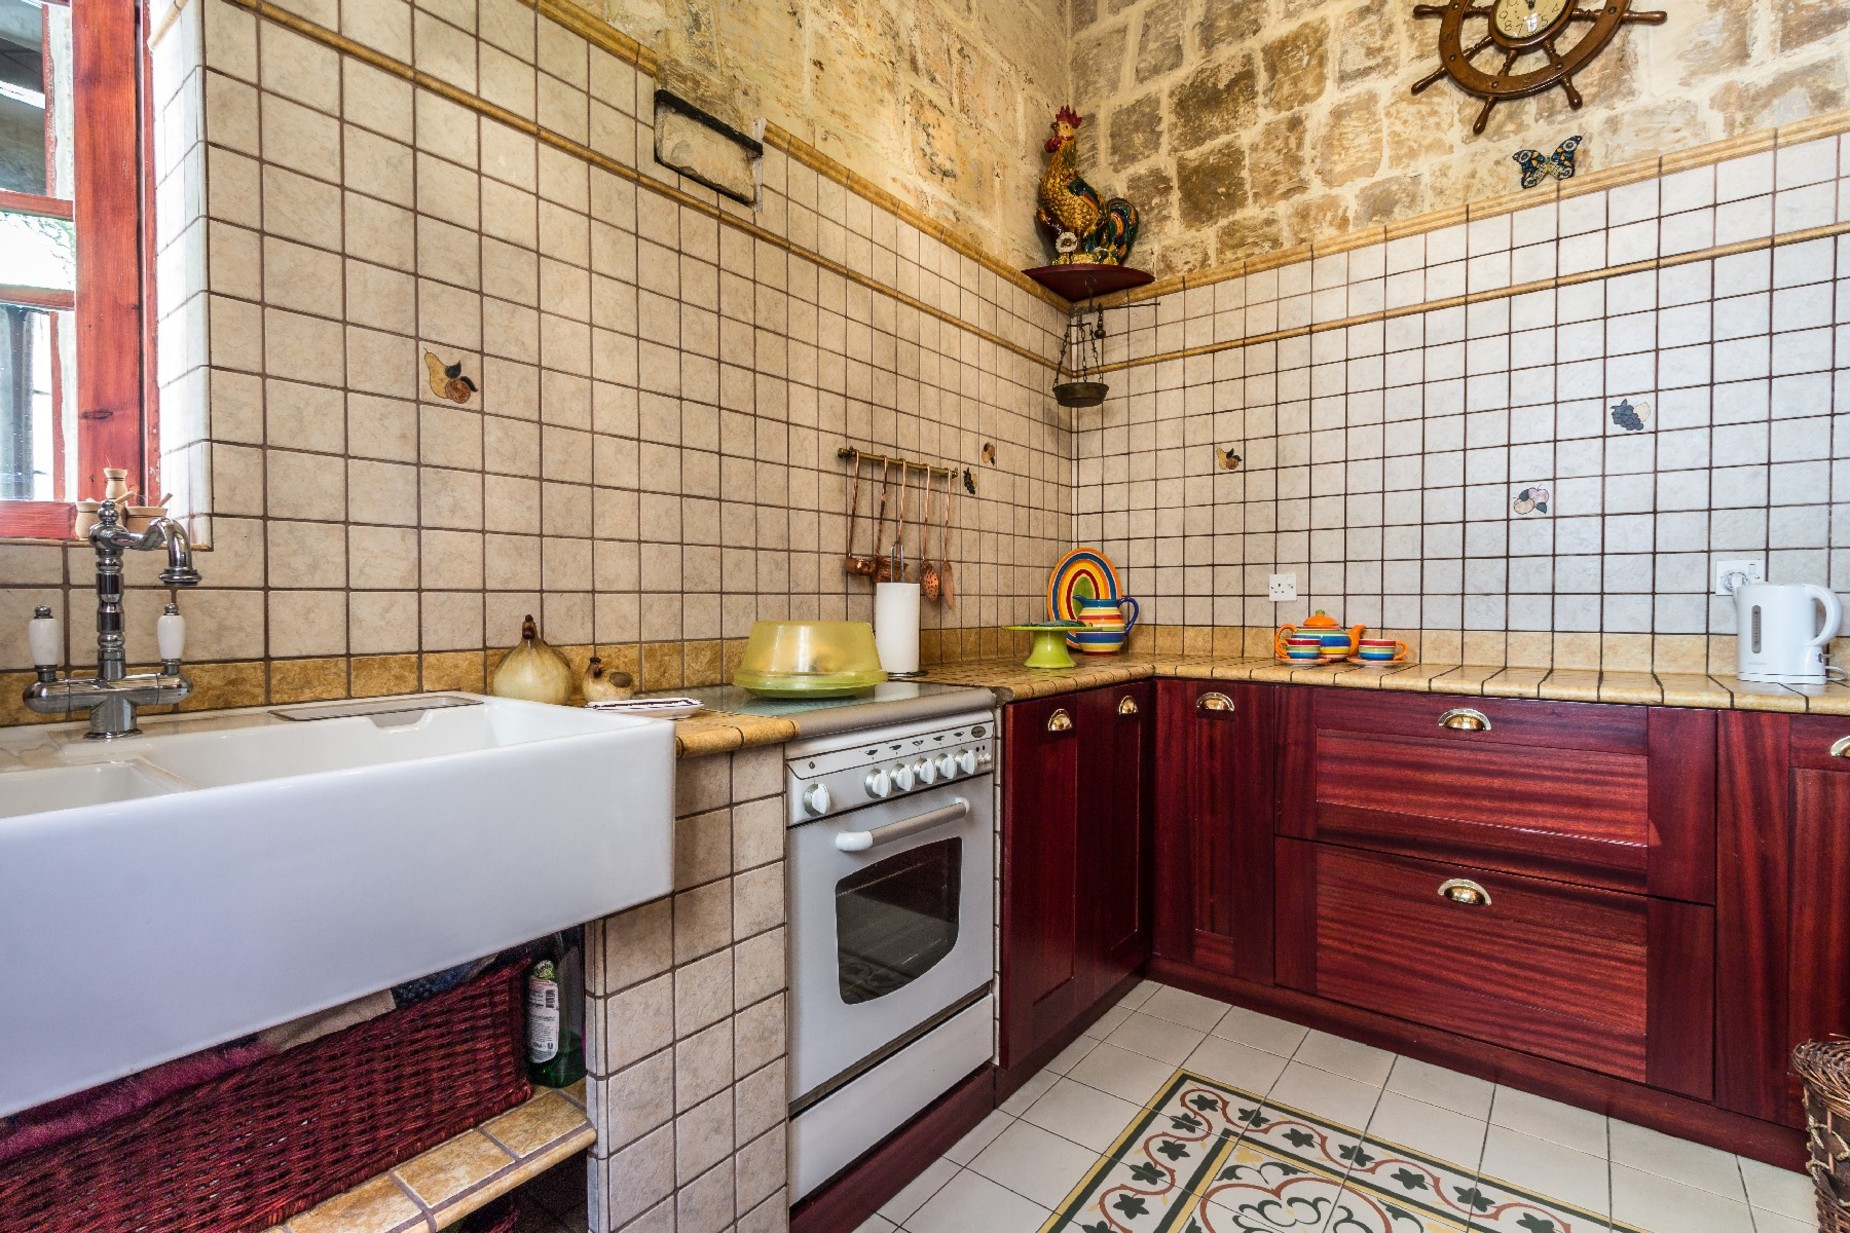 4 bed Town House For Sale in Birkirkara, Birkirkara - thumb 5